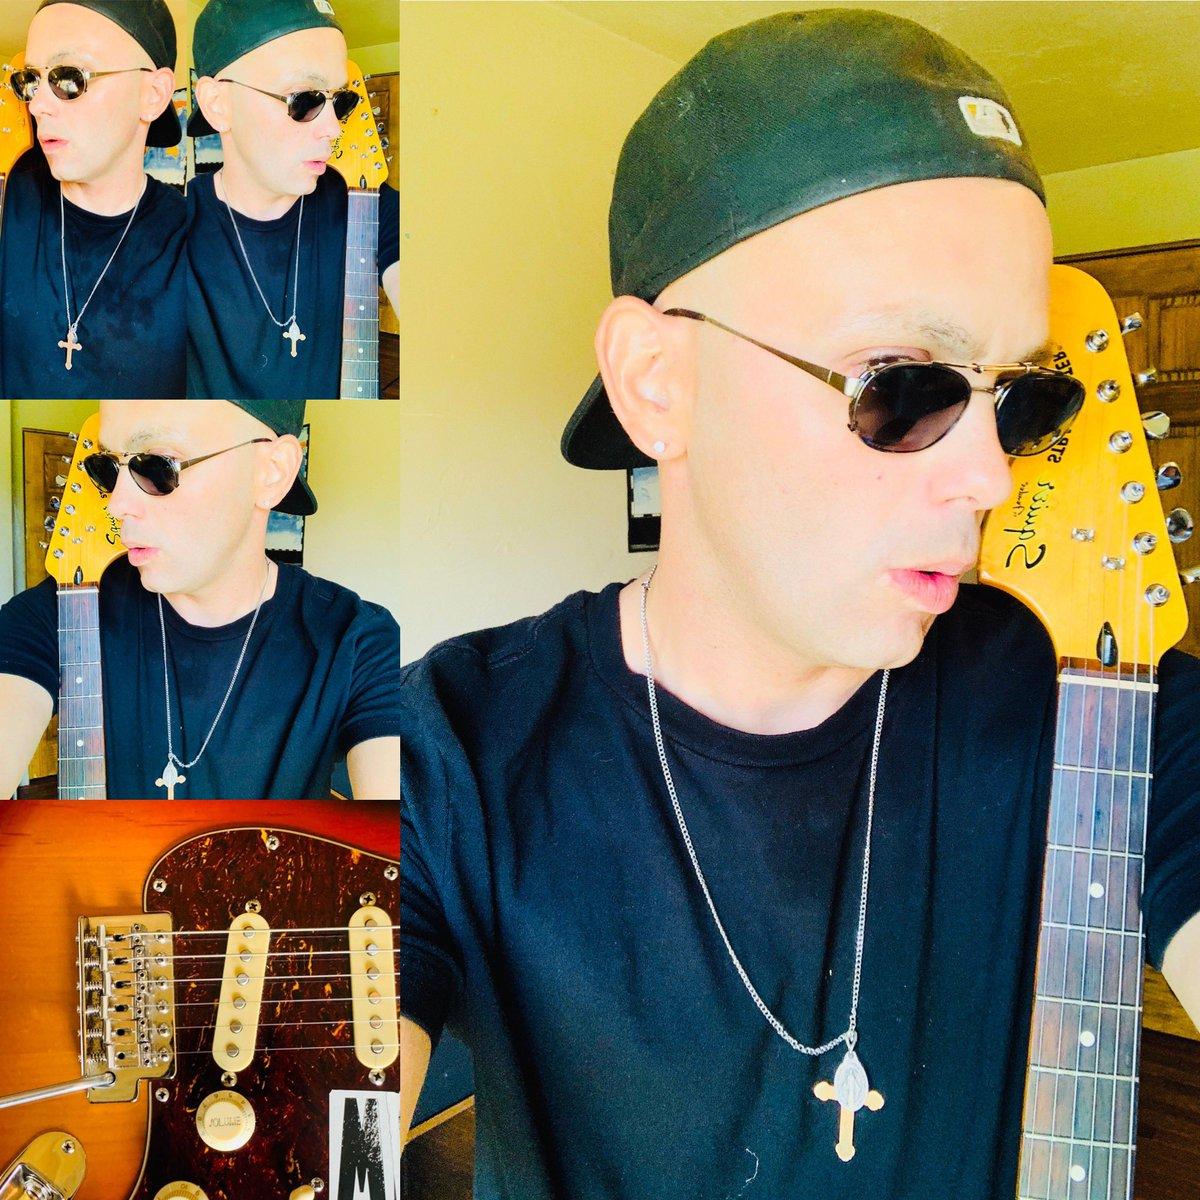 Birds crossing hairs do 7/5/20 https://youtu.be/E8fel8tYFZo via @YouTube#music #radio #entertainment #fendersquier #art #bluesmusic #fenderstratcaster #dolbyon #music #fenderamps #entertainmentpic.twitter.com/R4nzLboP8P